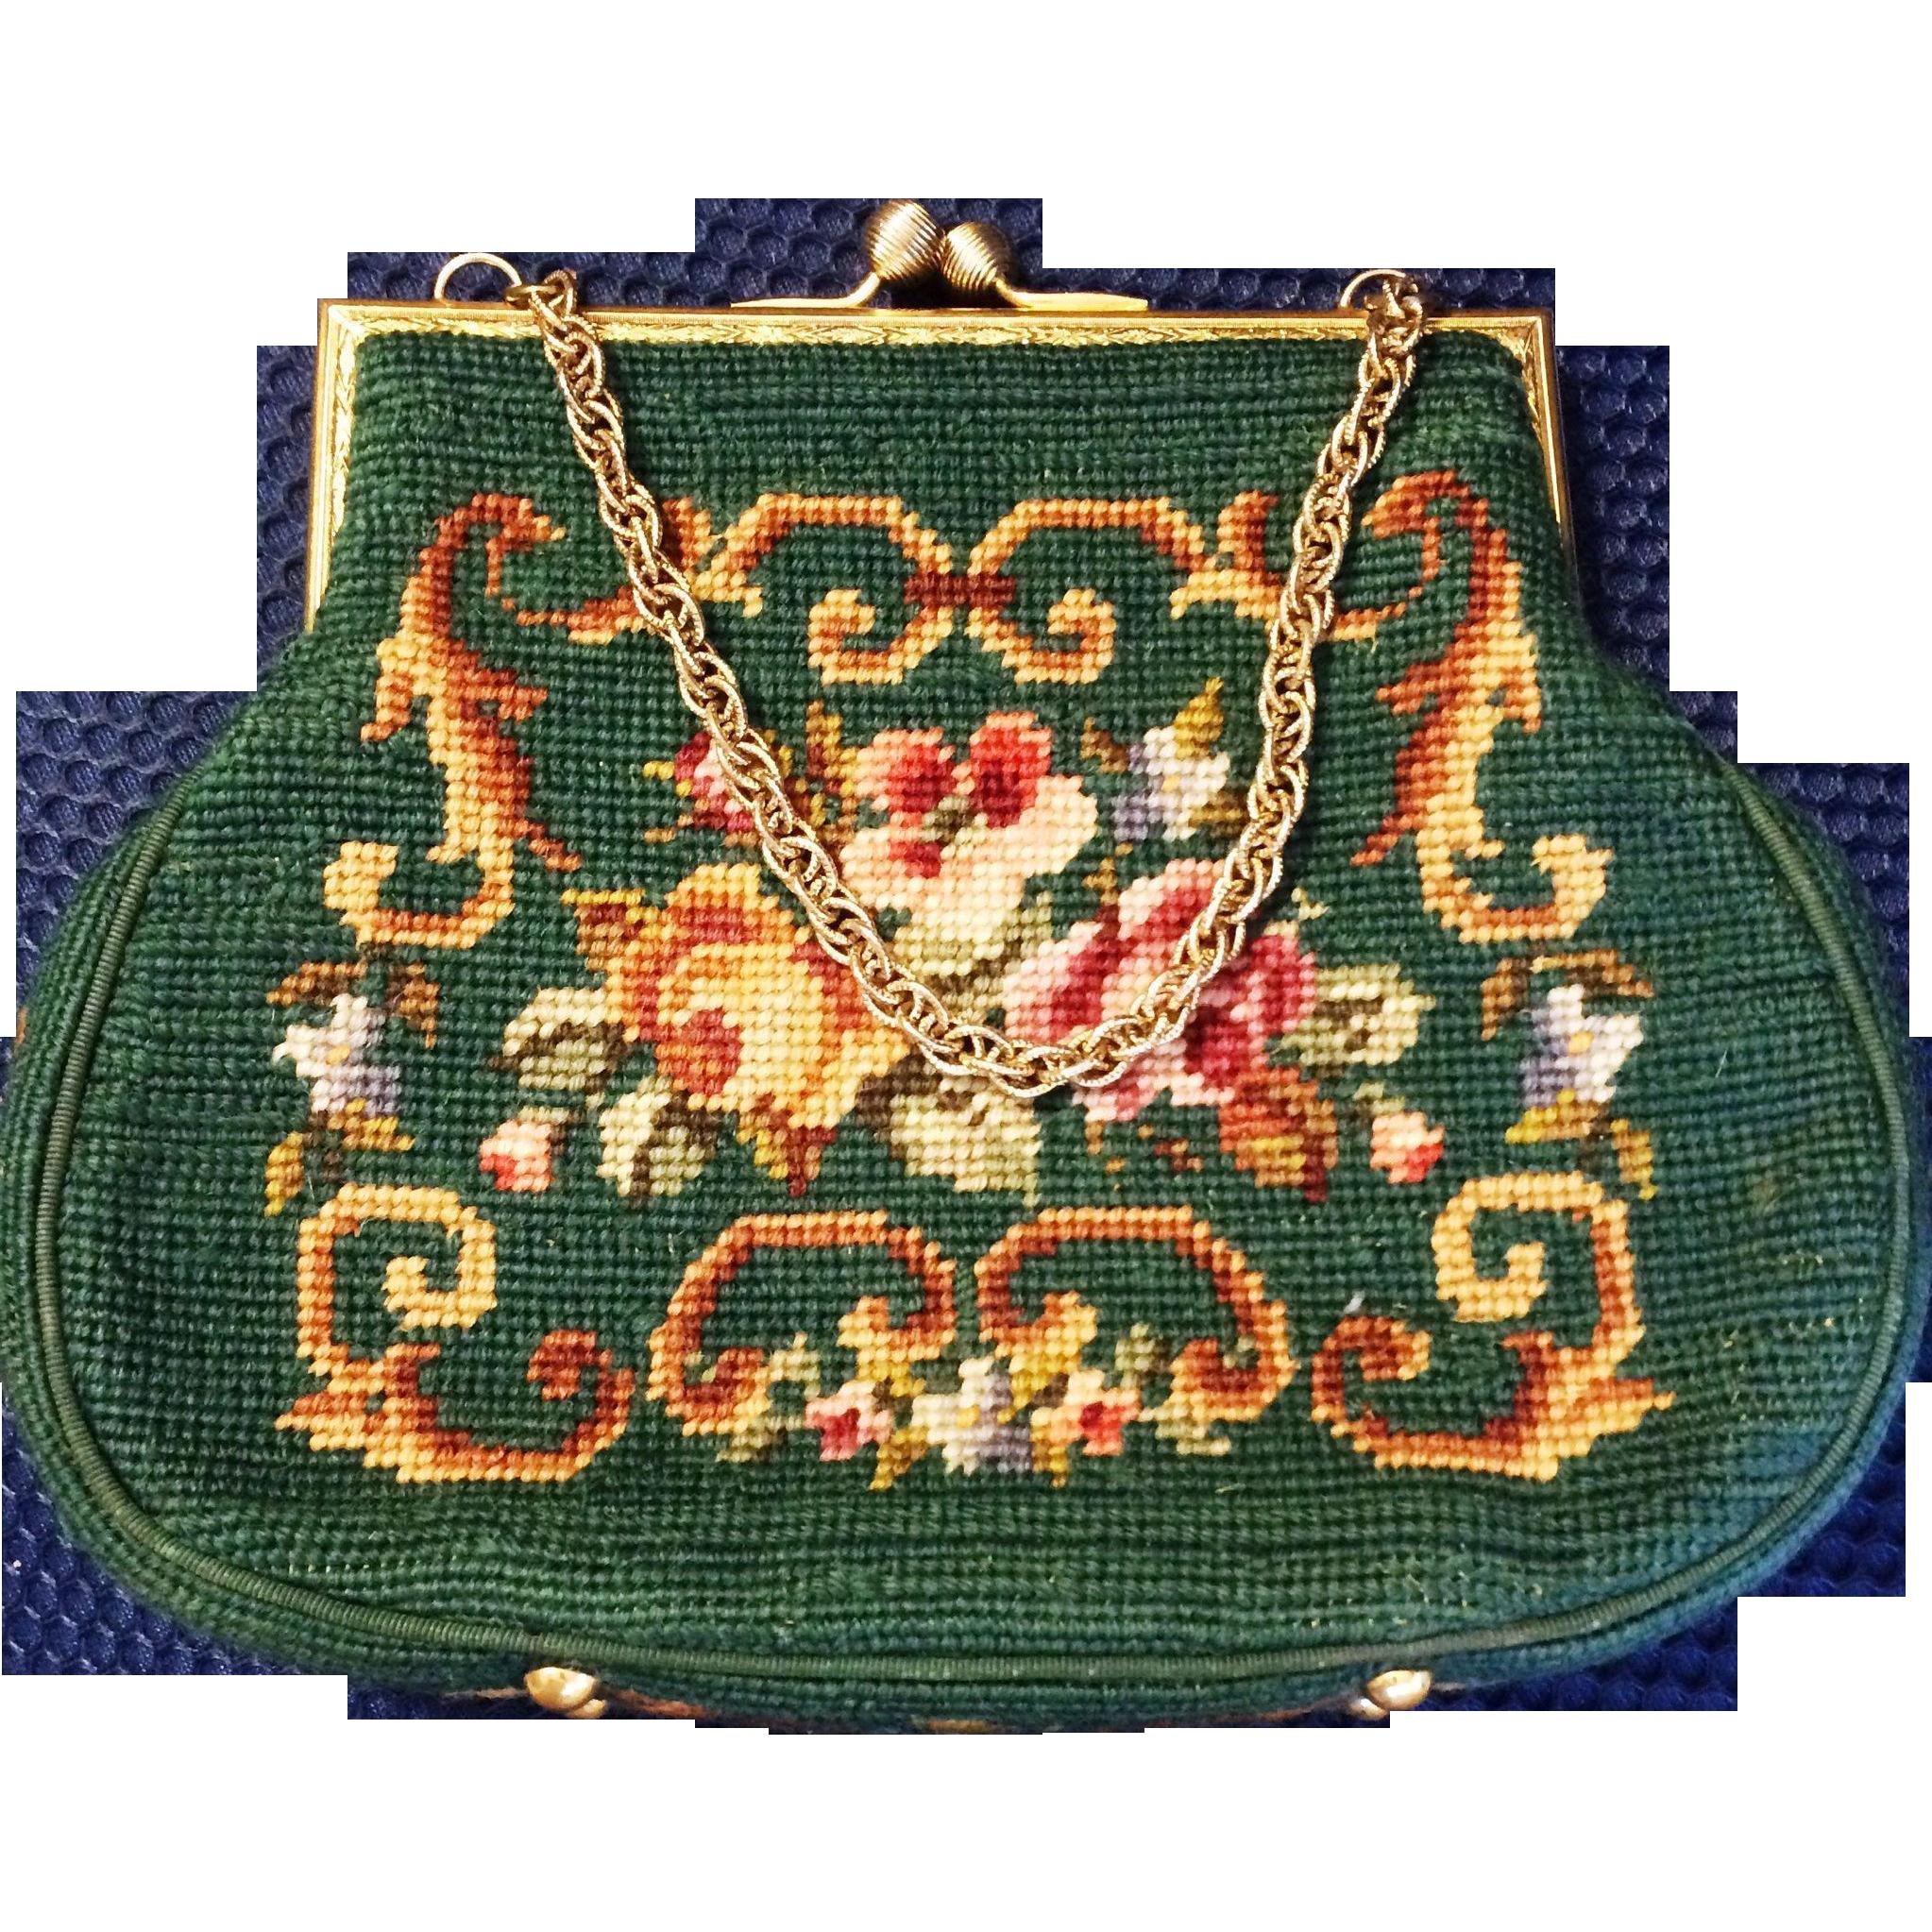 1950s Handmade Needlepoint Handbag Purse Green with roses